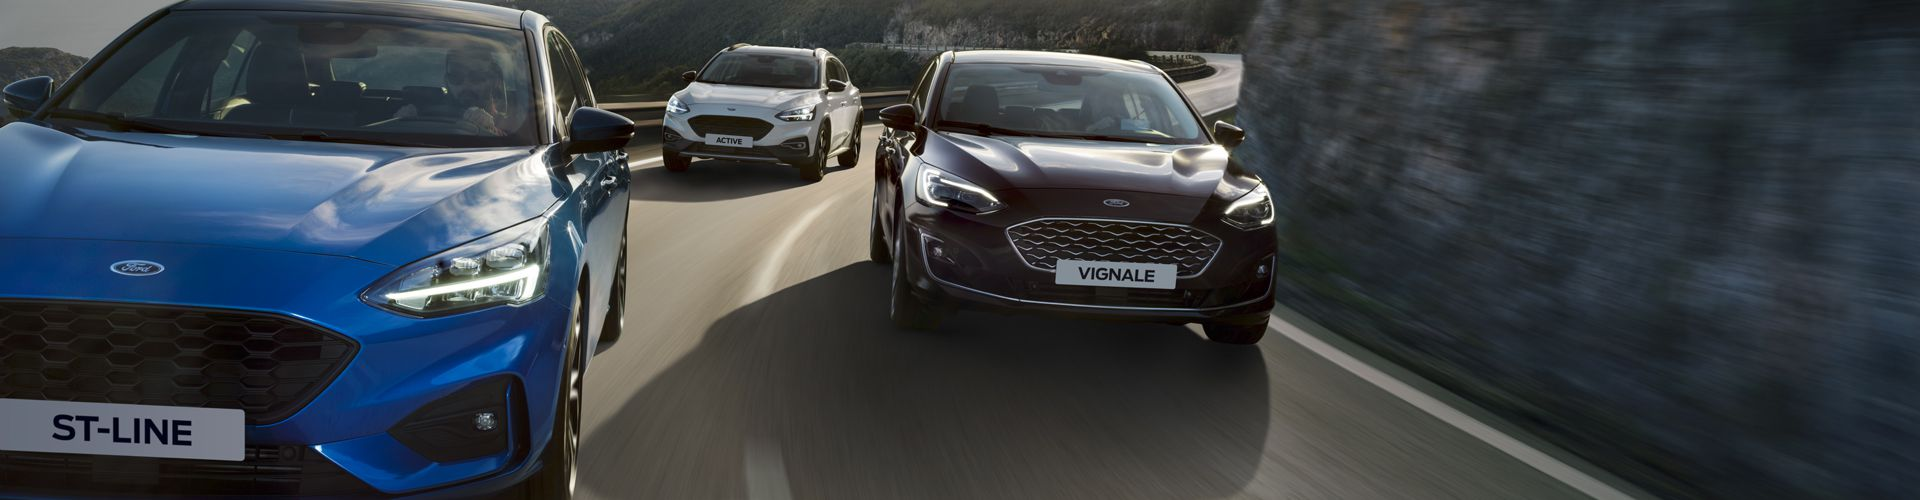 Ford Focus St Line, Vignale, Active - Liapis Bros